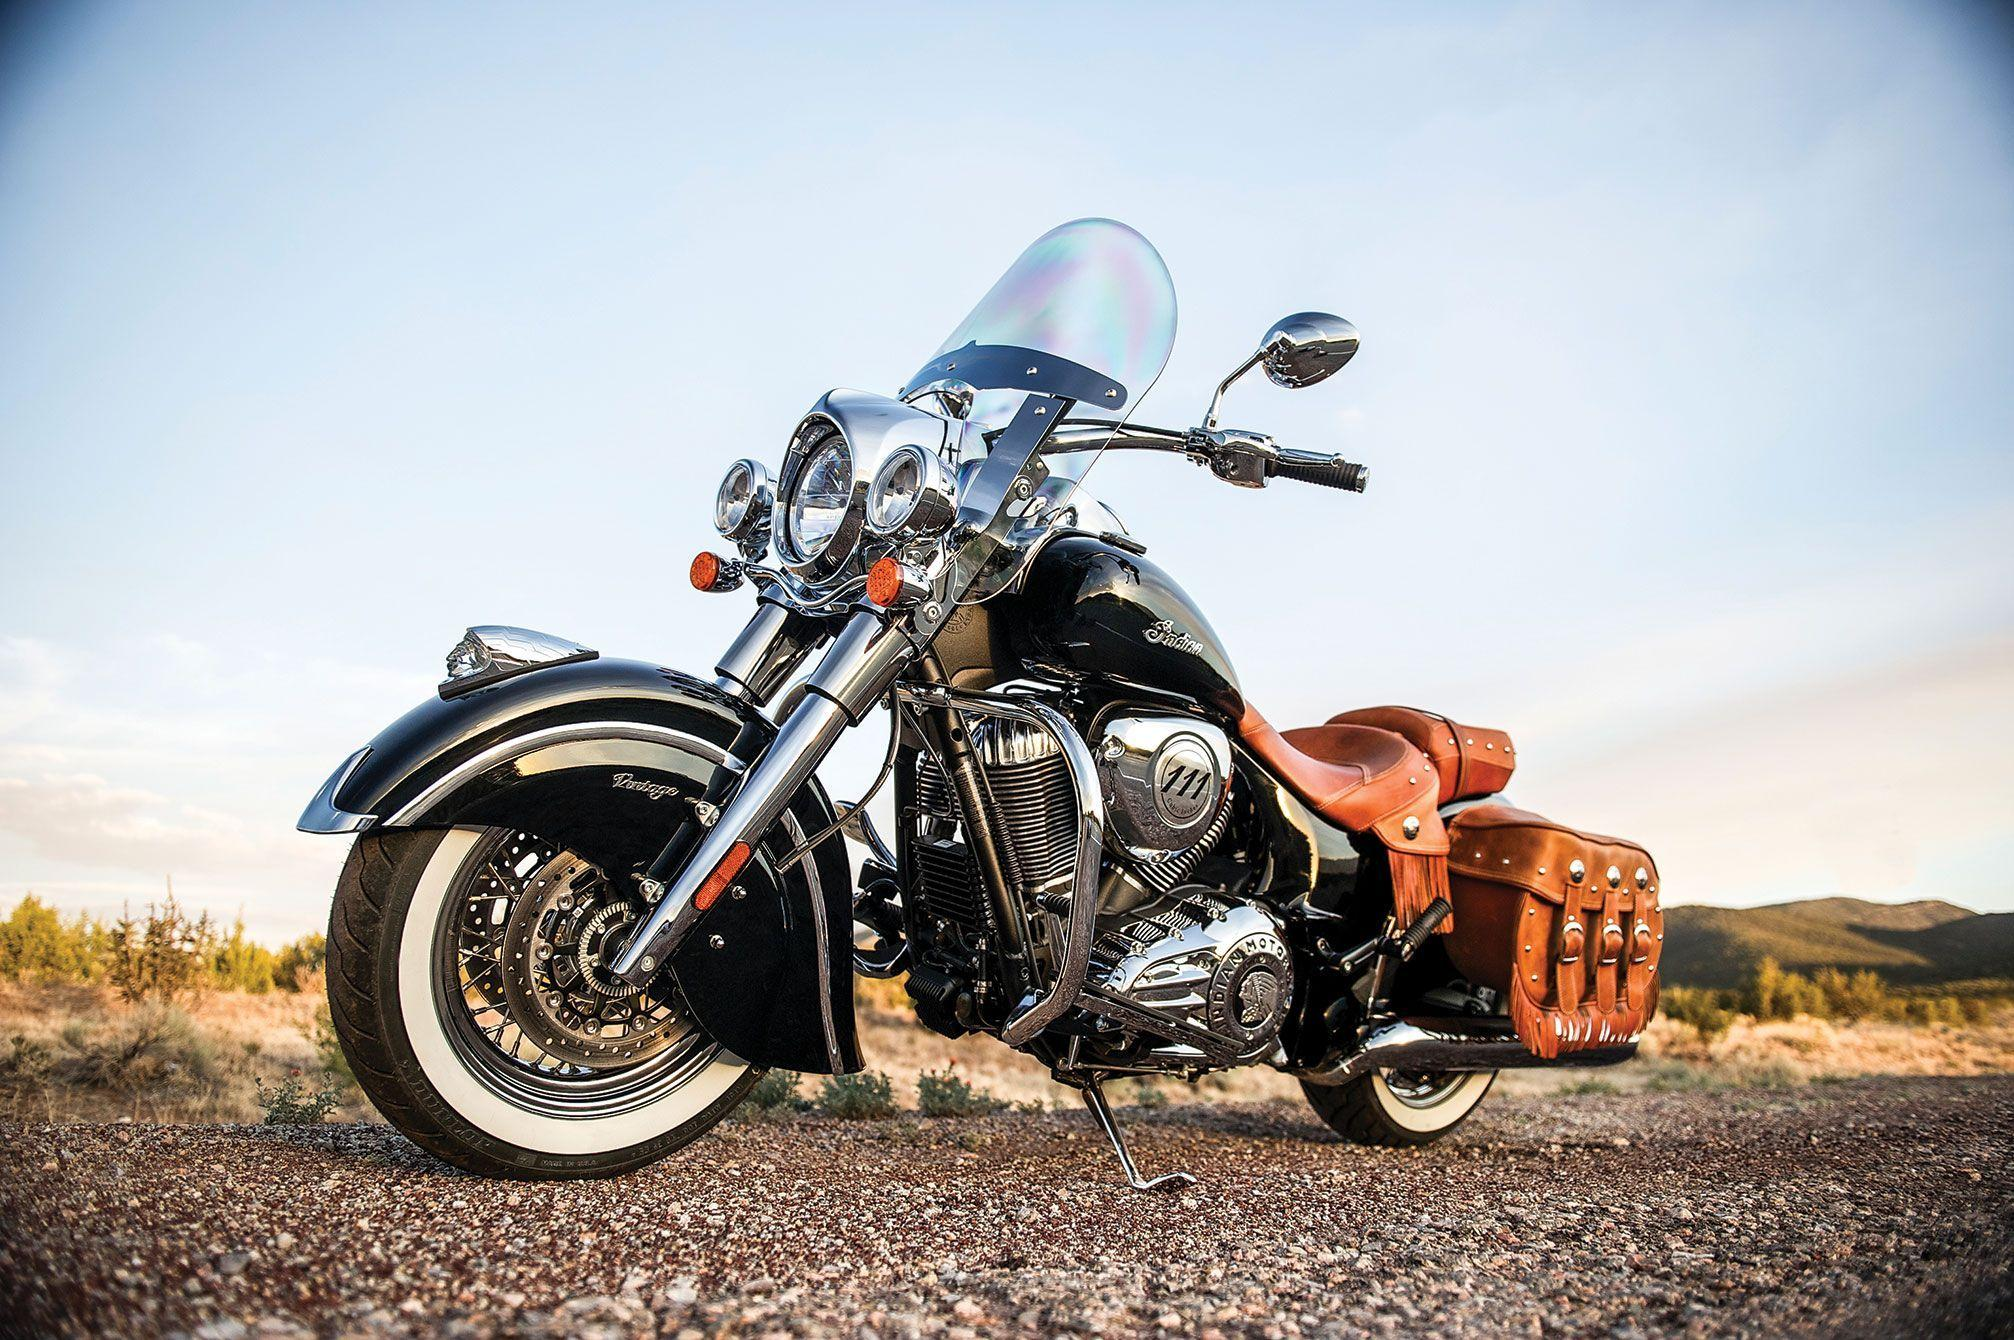 big motorcycles wallpapers - photo #28